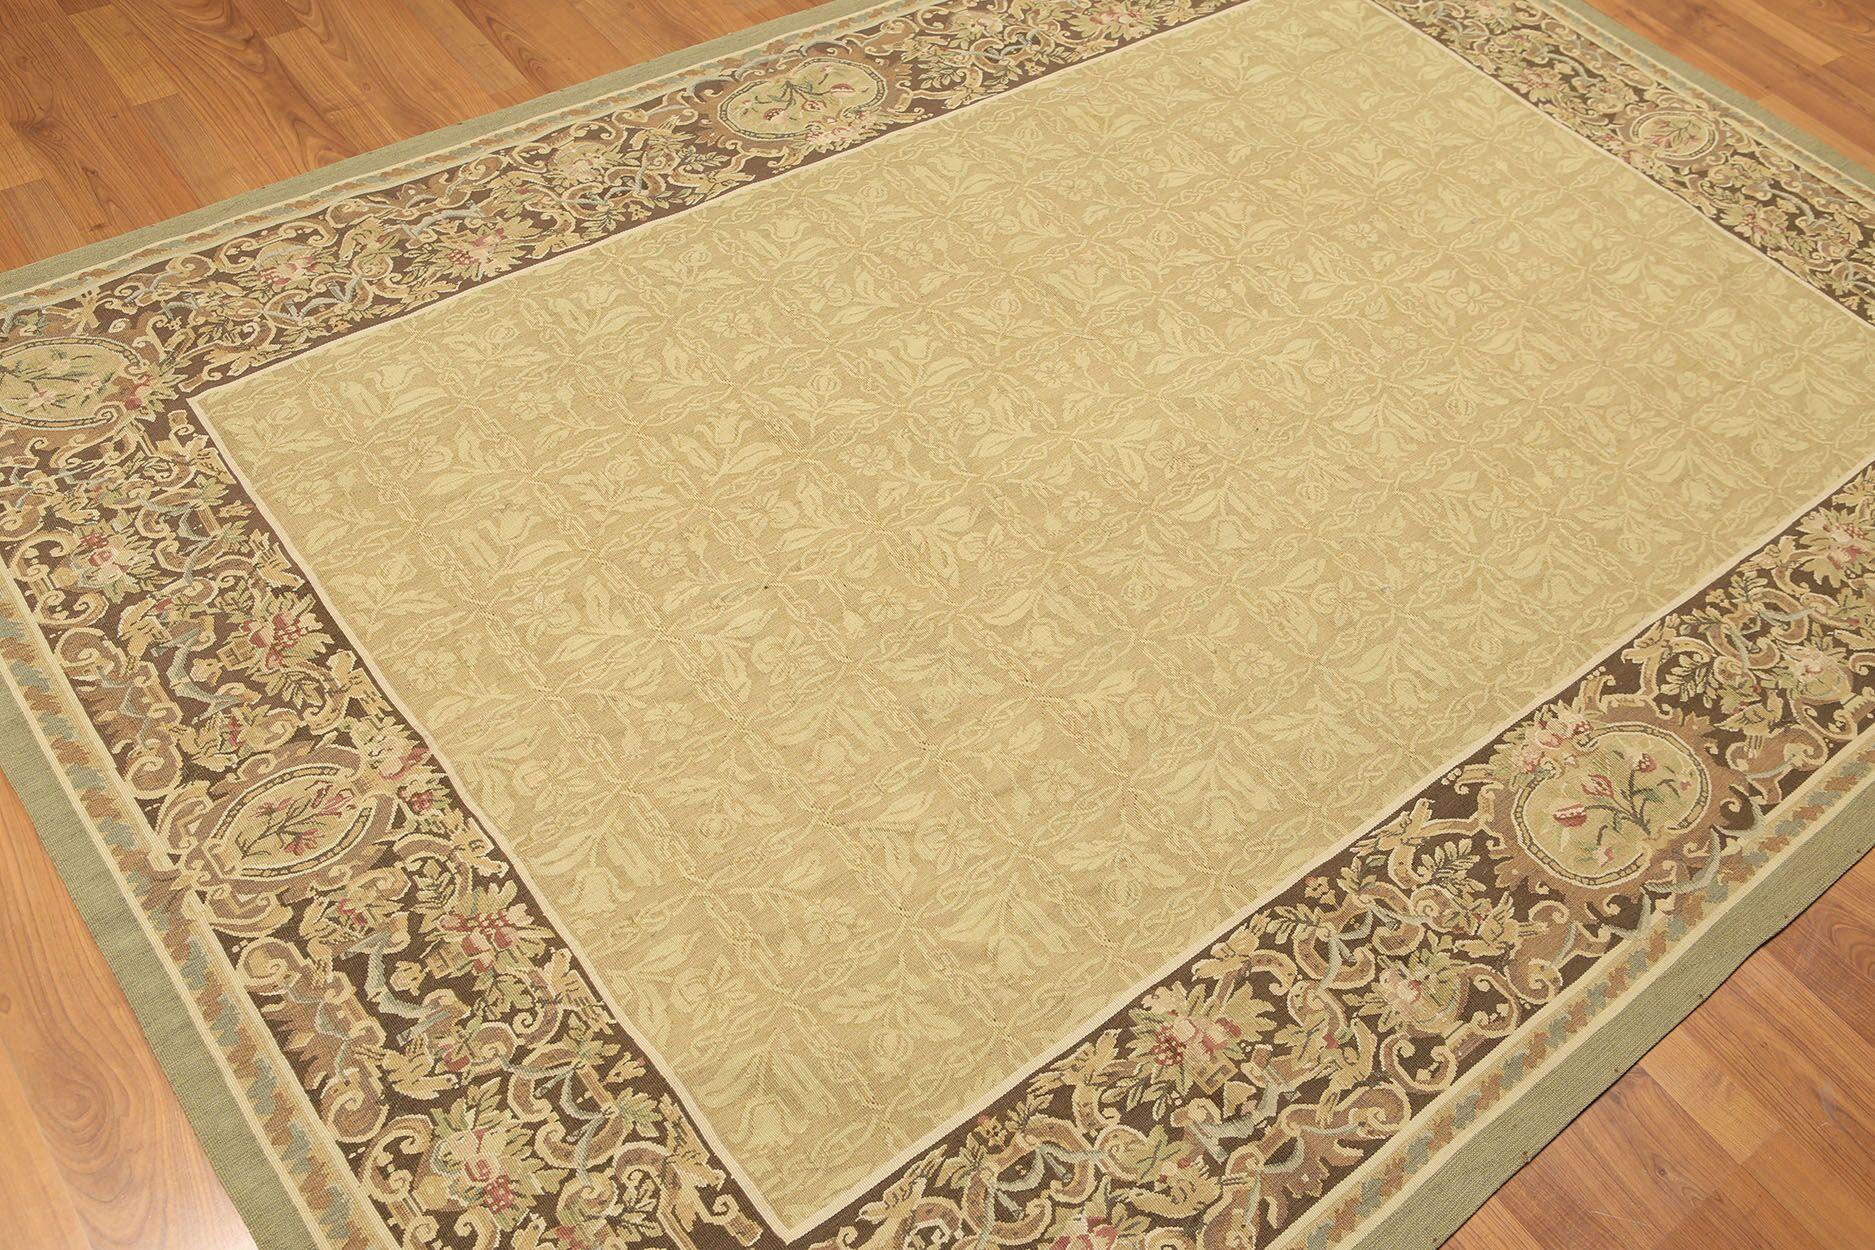 One-of-a-Kind Persian Aubushan Oriental Hand-Woven Wool Greenish Gold/Chocolate Area Rug